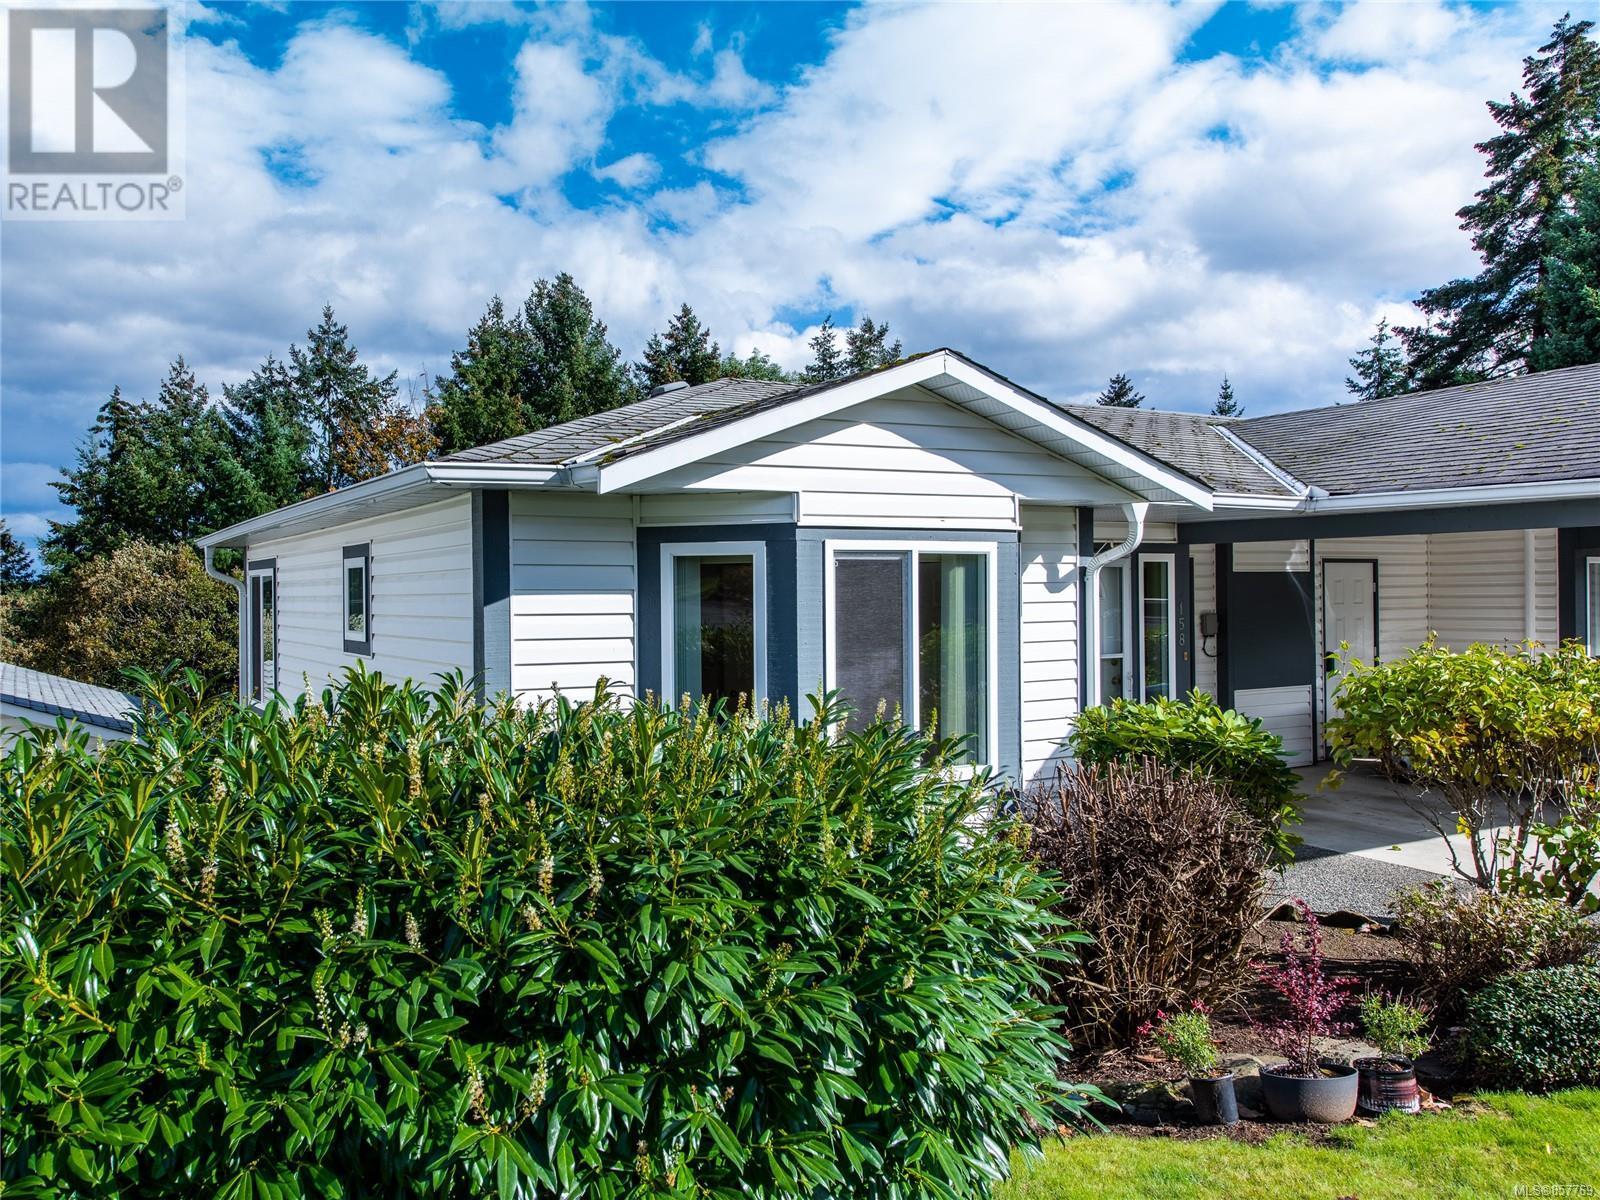 158 Bowlsby St, Nanaimo, British Columbia  V9R 5K1 - Photo 12 - 857769